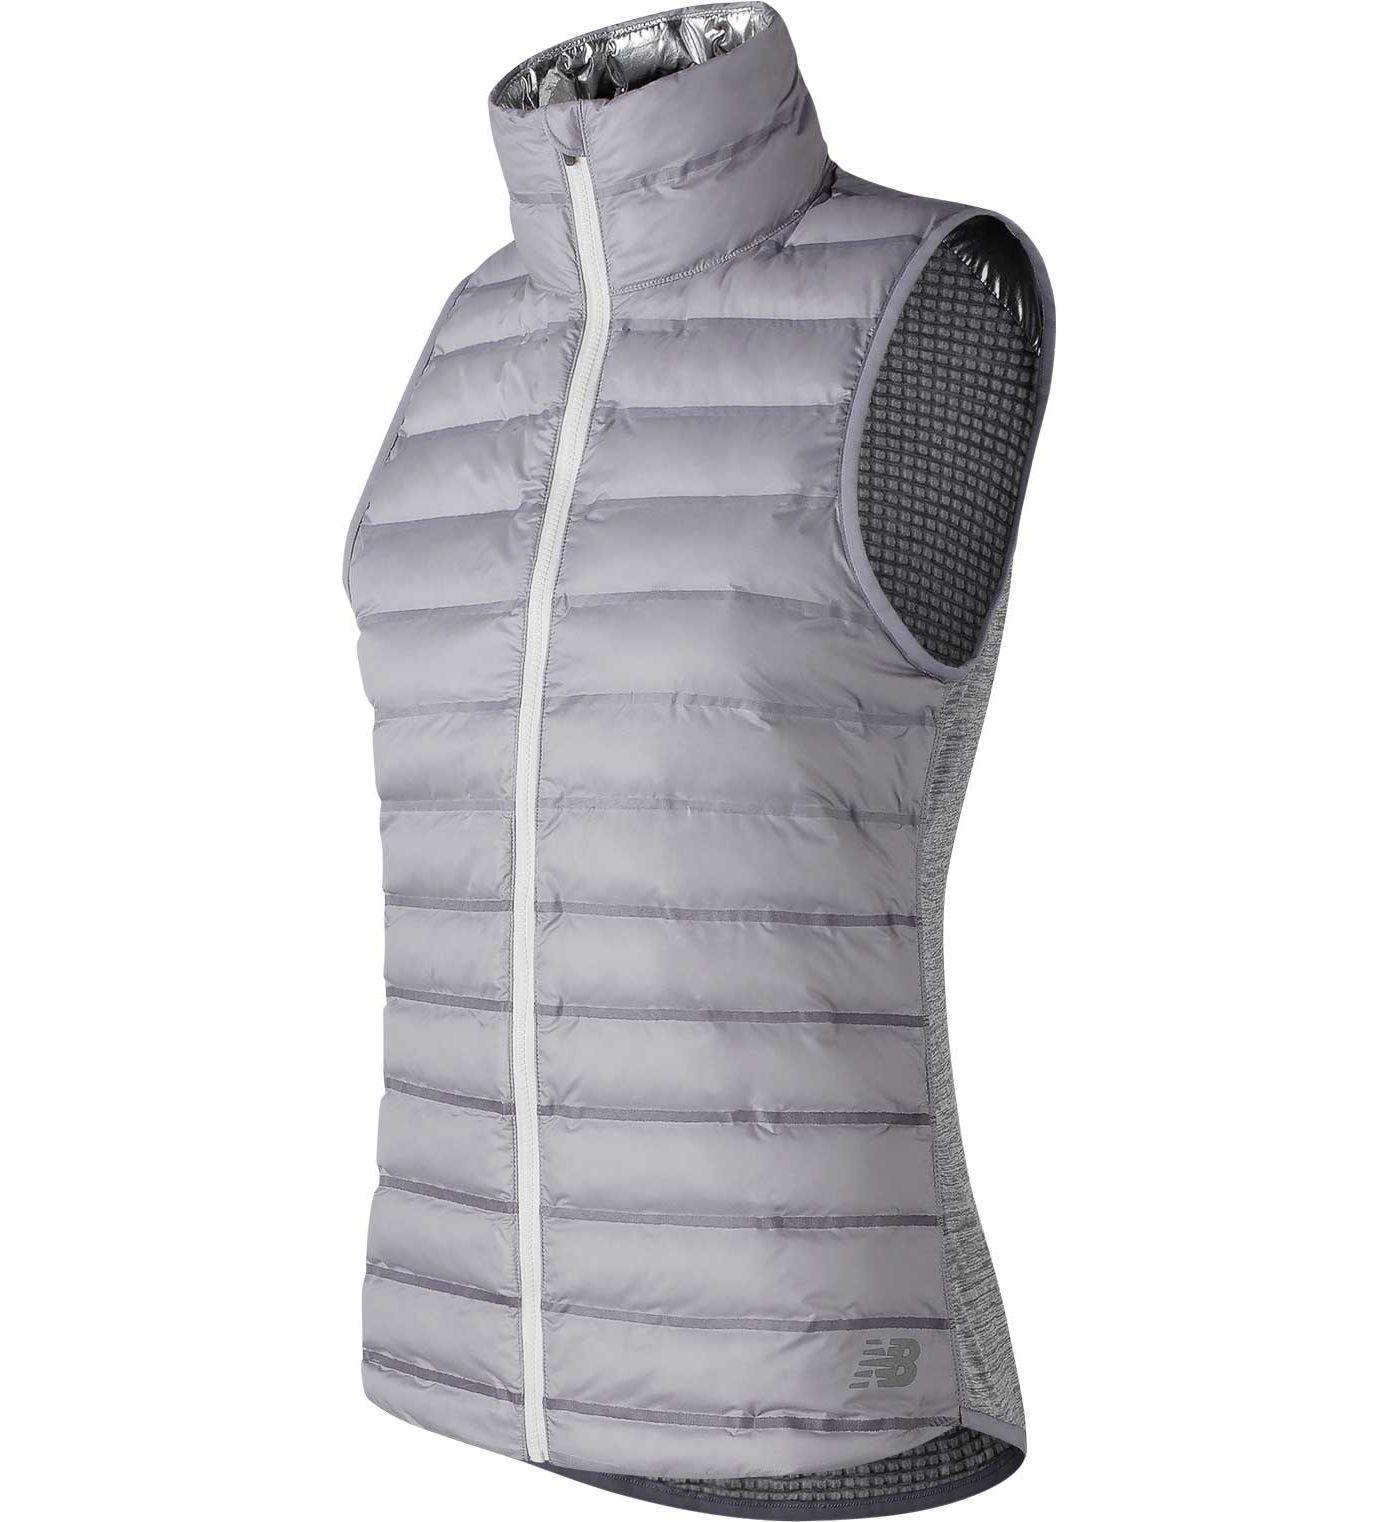 New Balance Women's Radiant Heat Bonded Vest